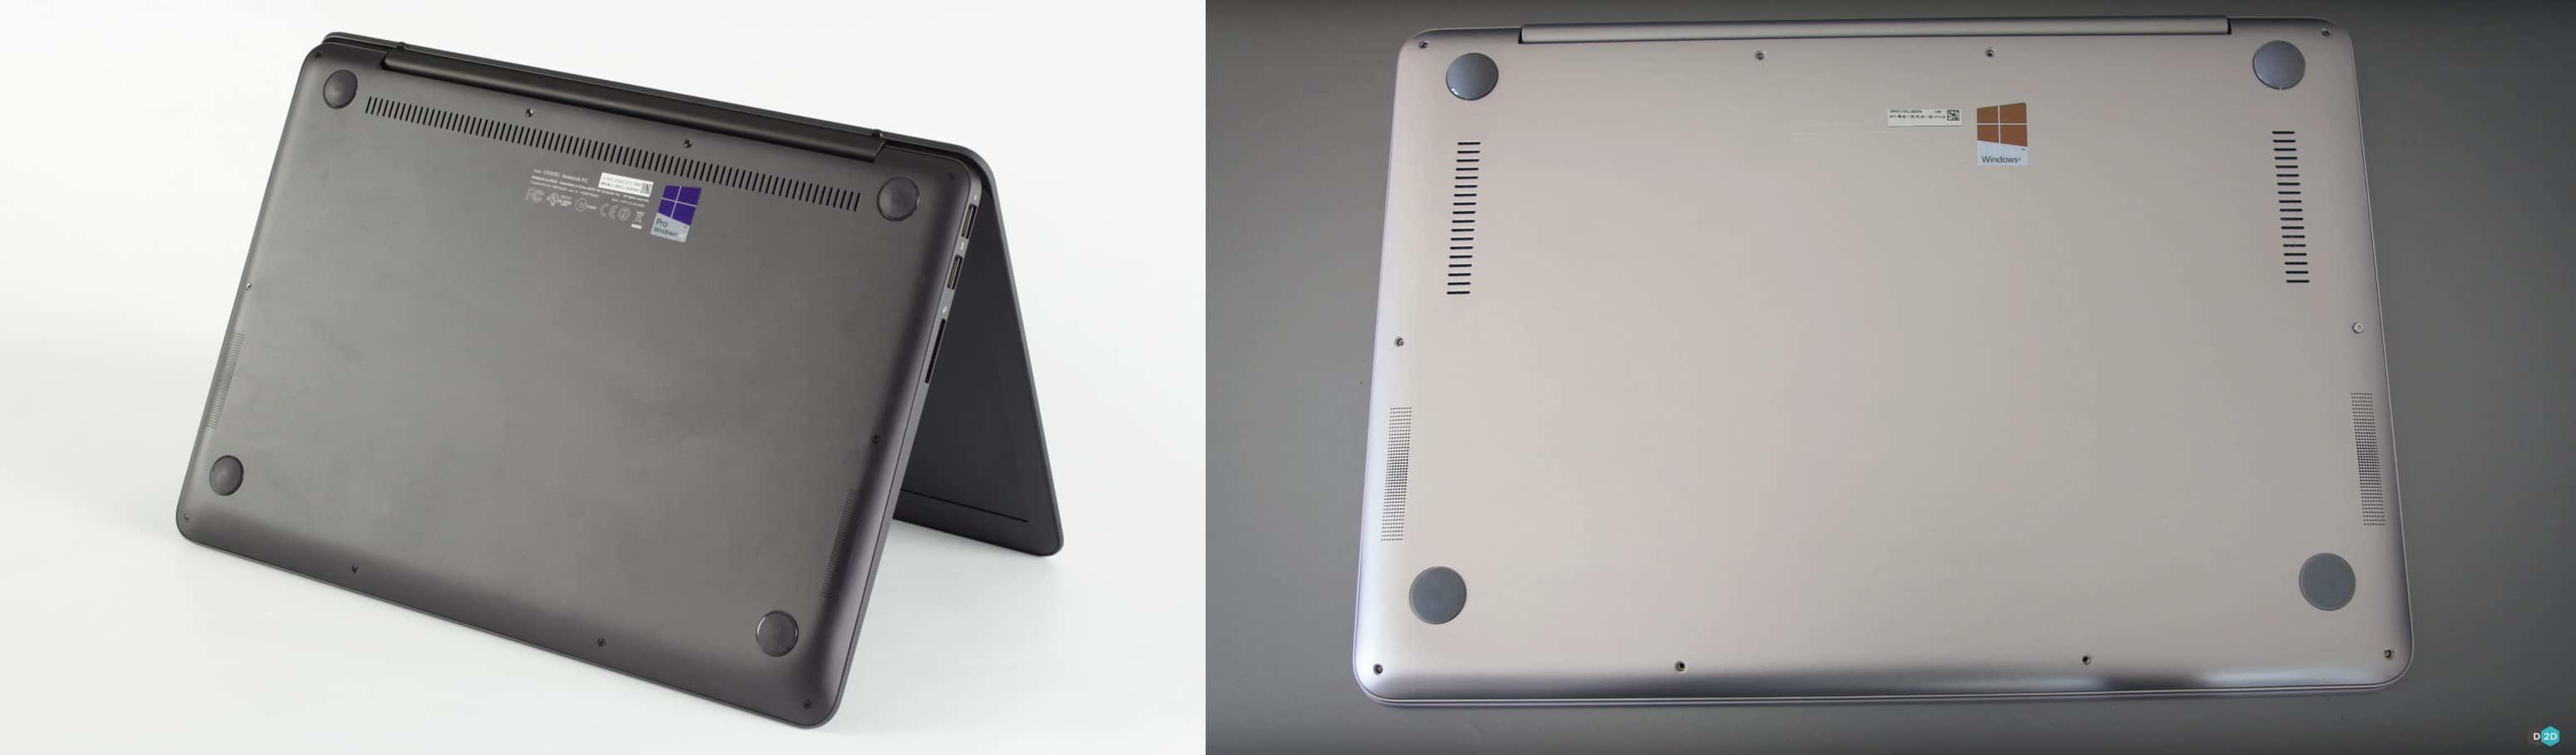 Bottom design: UX305UA (left) and UX306UA (right)